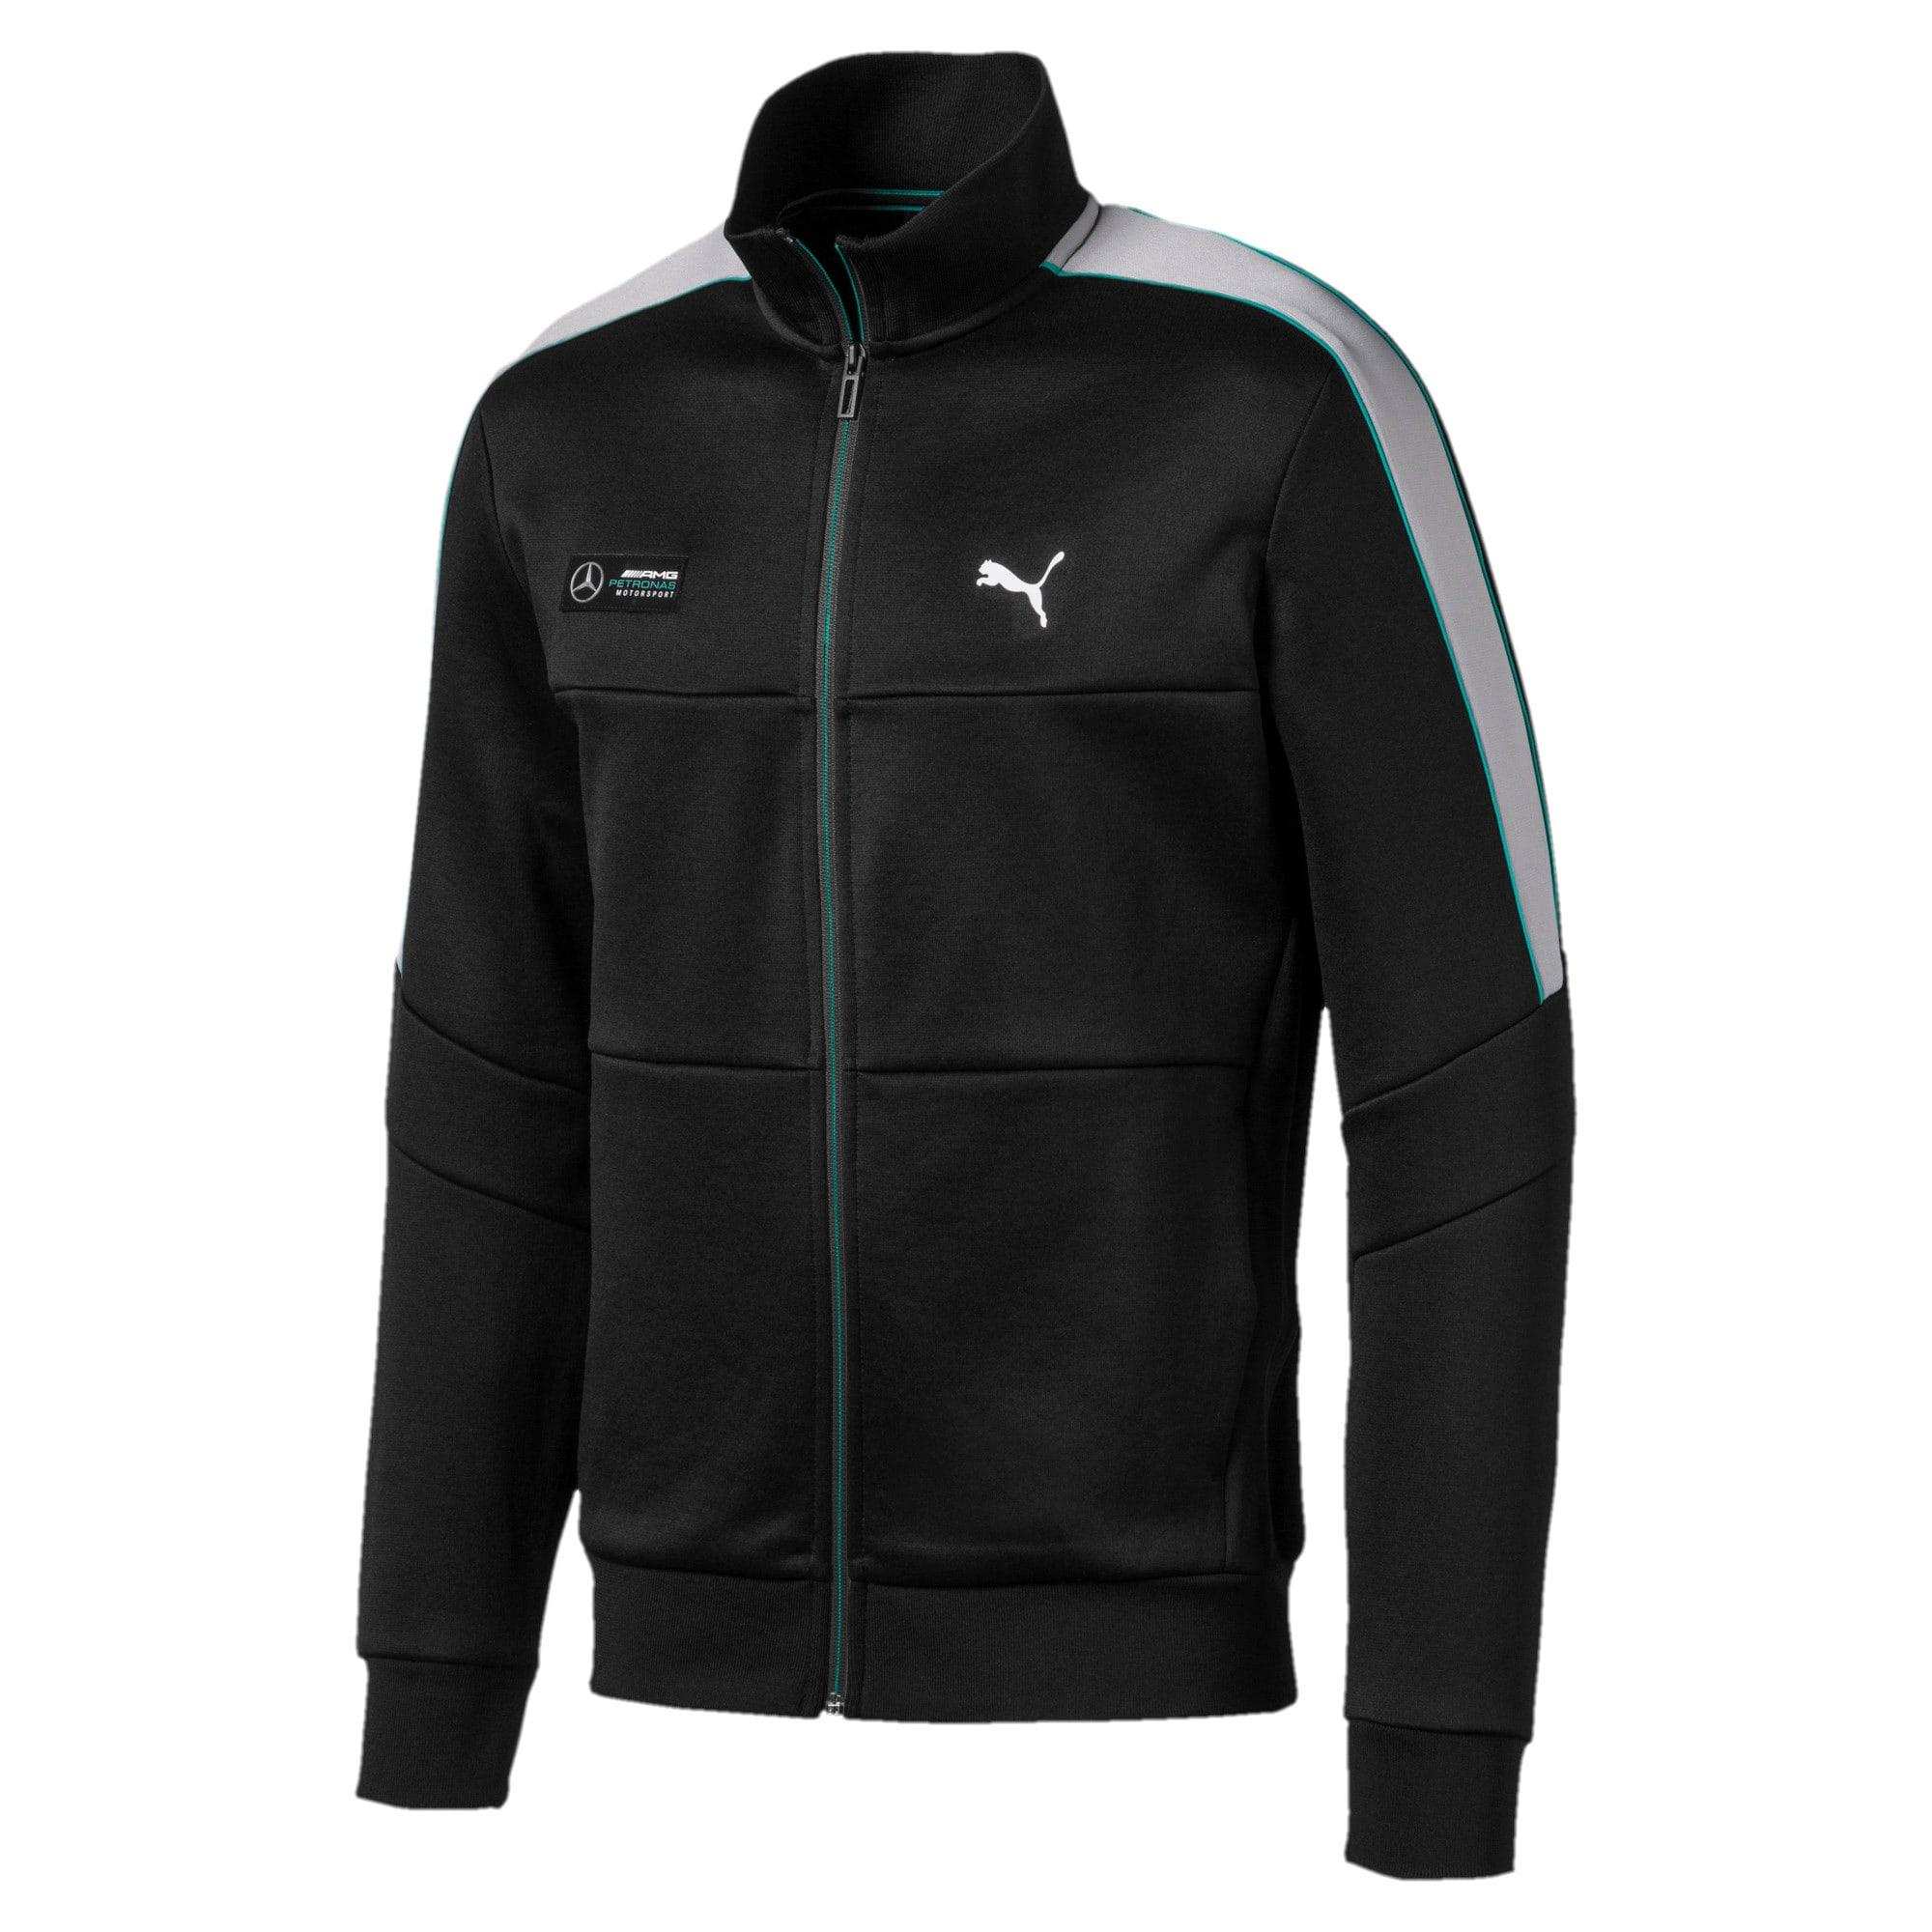 Thumbnail 5 of MAPM T7 Men's Track Jacket, Puma Black, medium